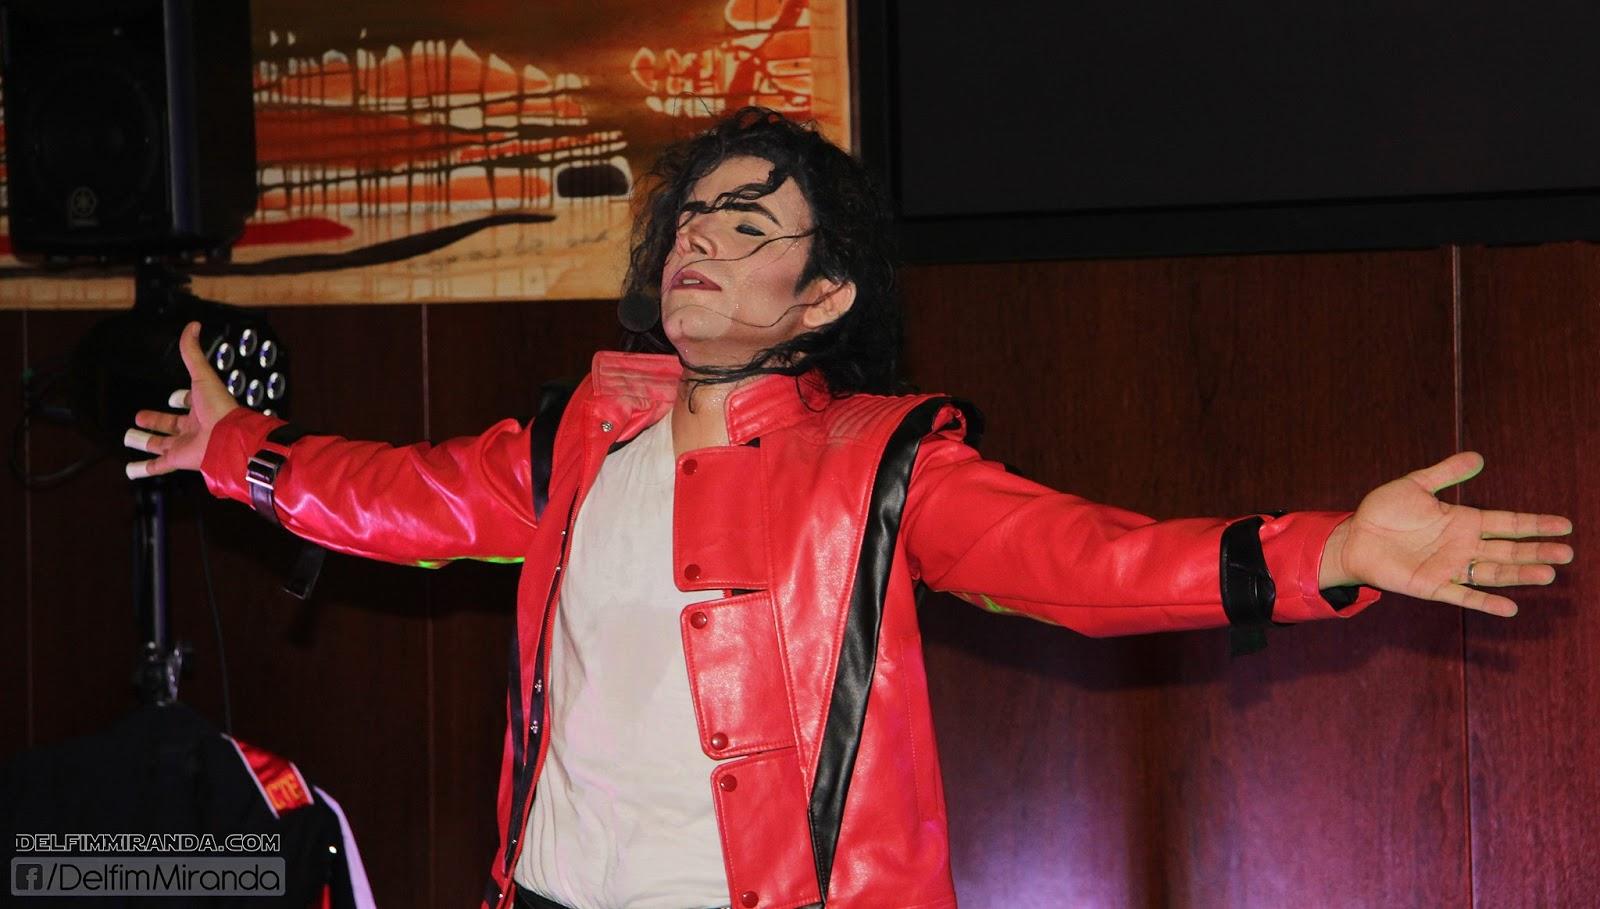 Delfim Miranda - Michael Jackson Tribute - Thriller - Live hotel performance